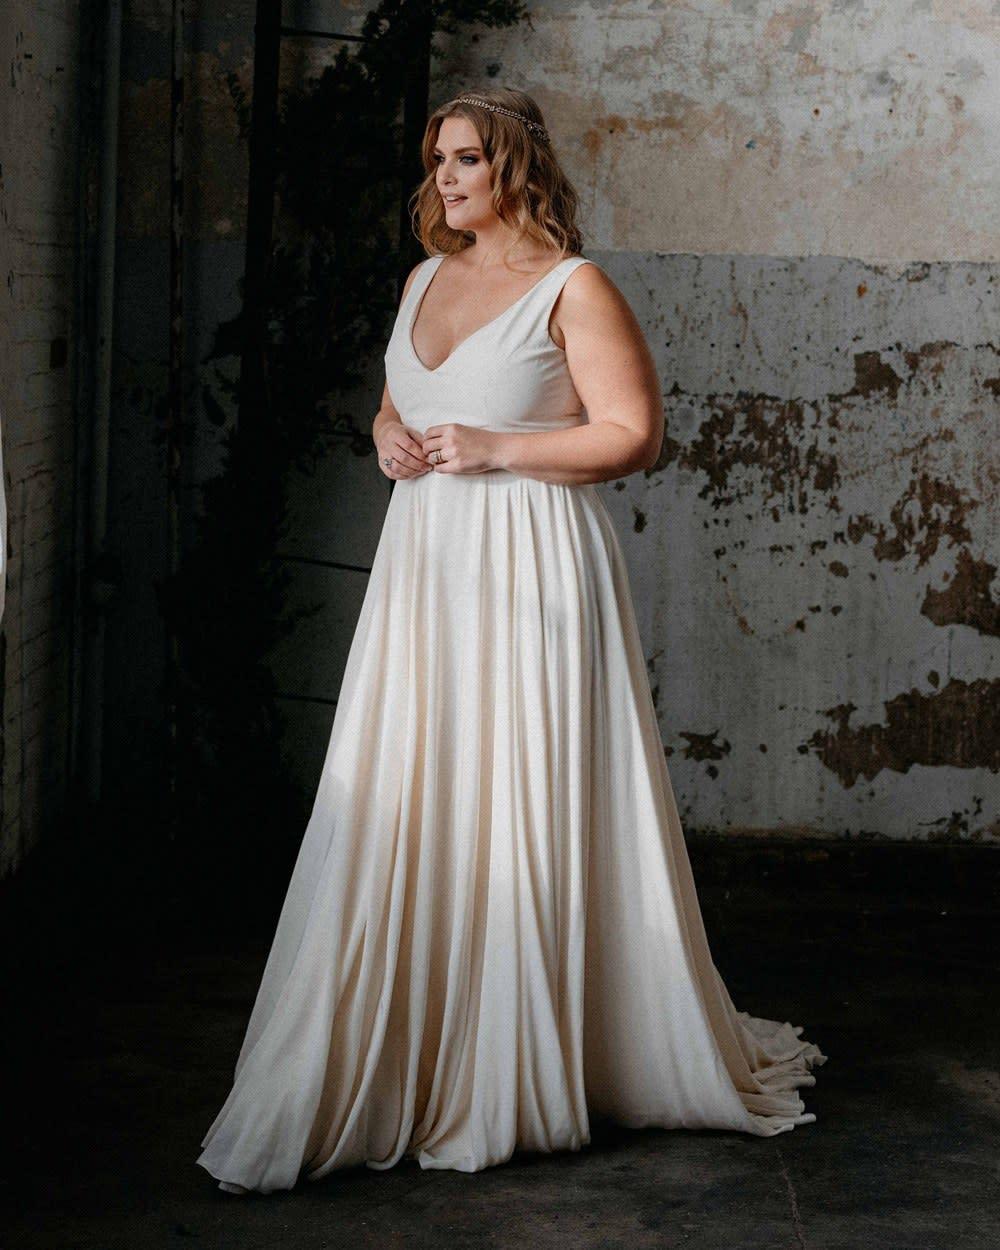 Etsy Wedding Dress.The Best Wedding Dress Shops On Etsy